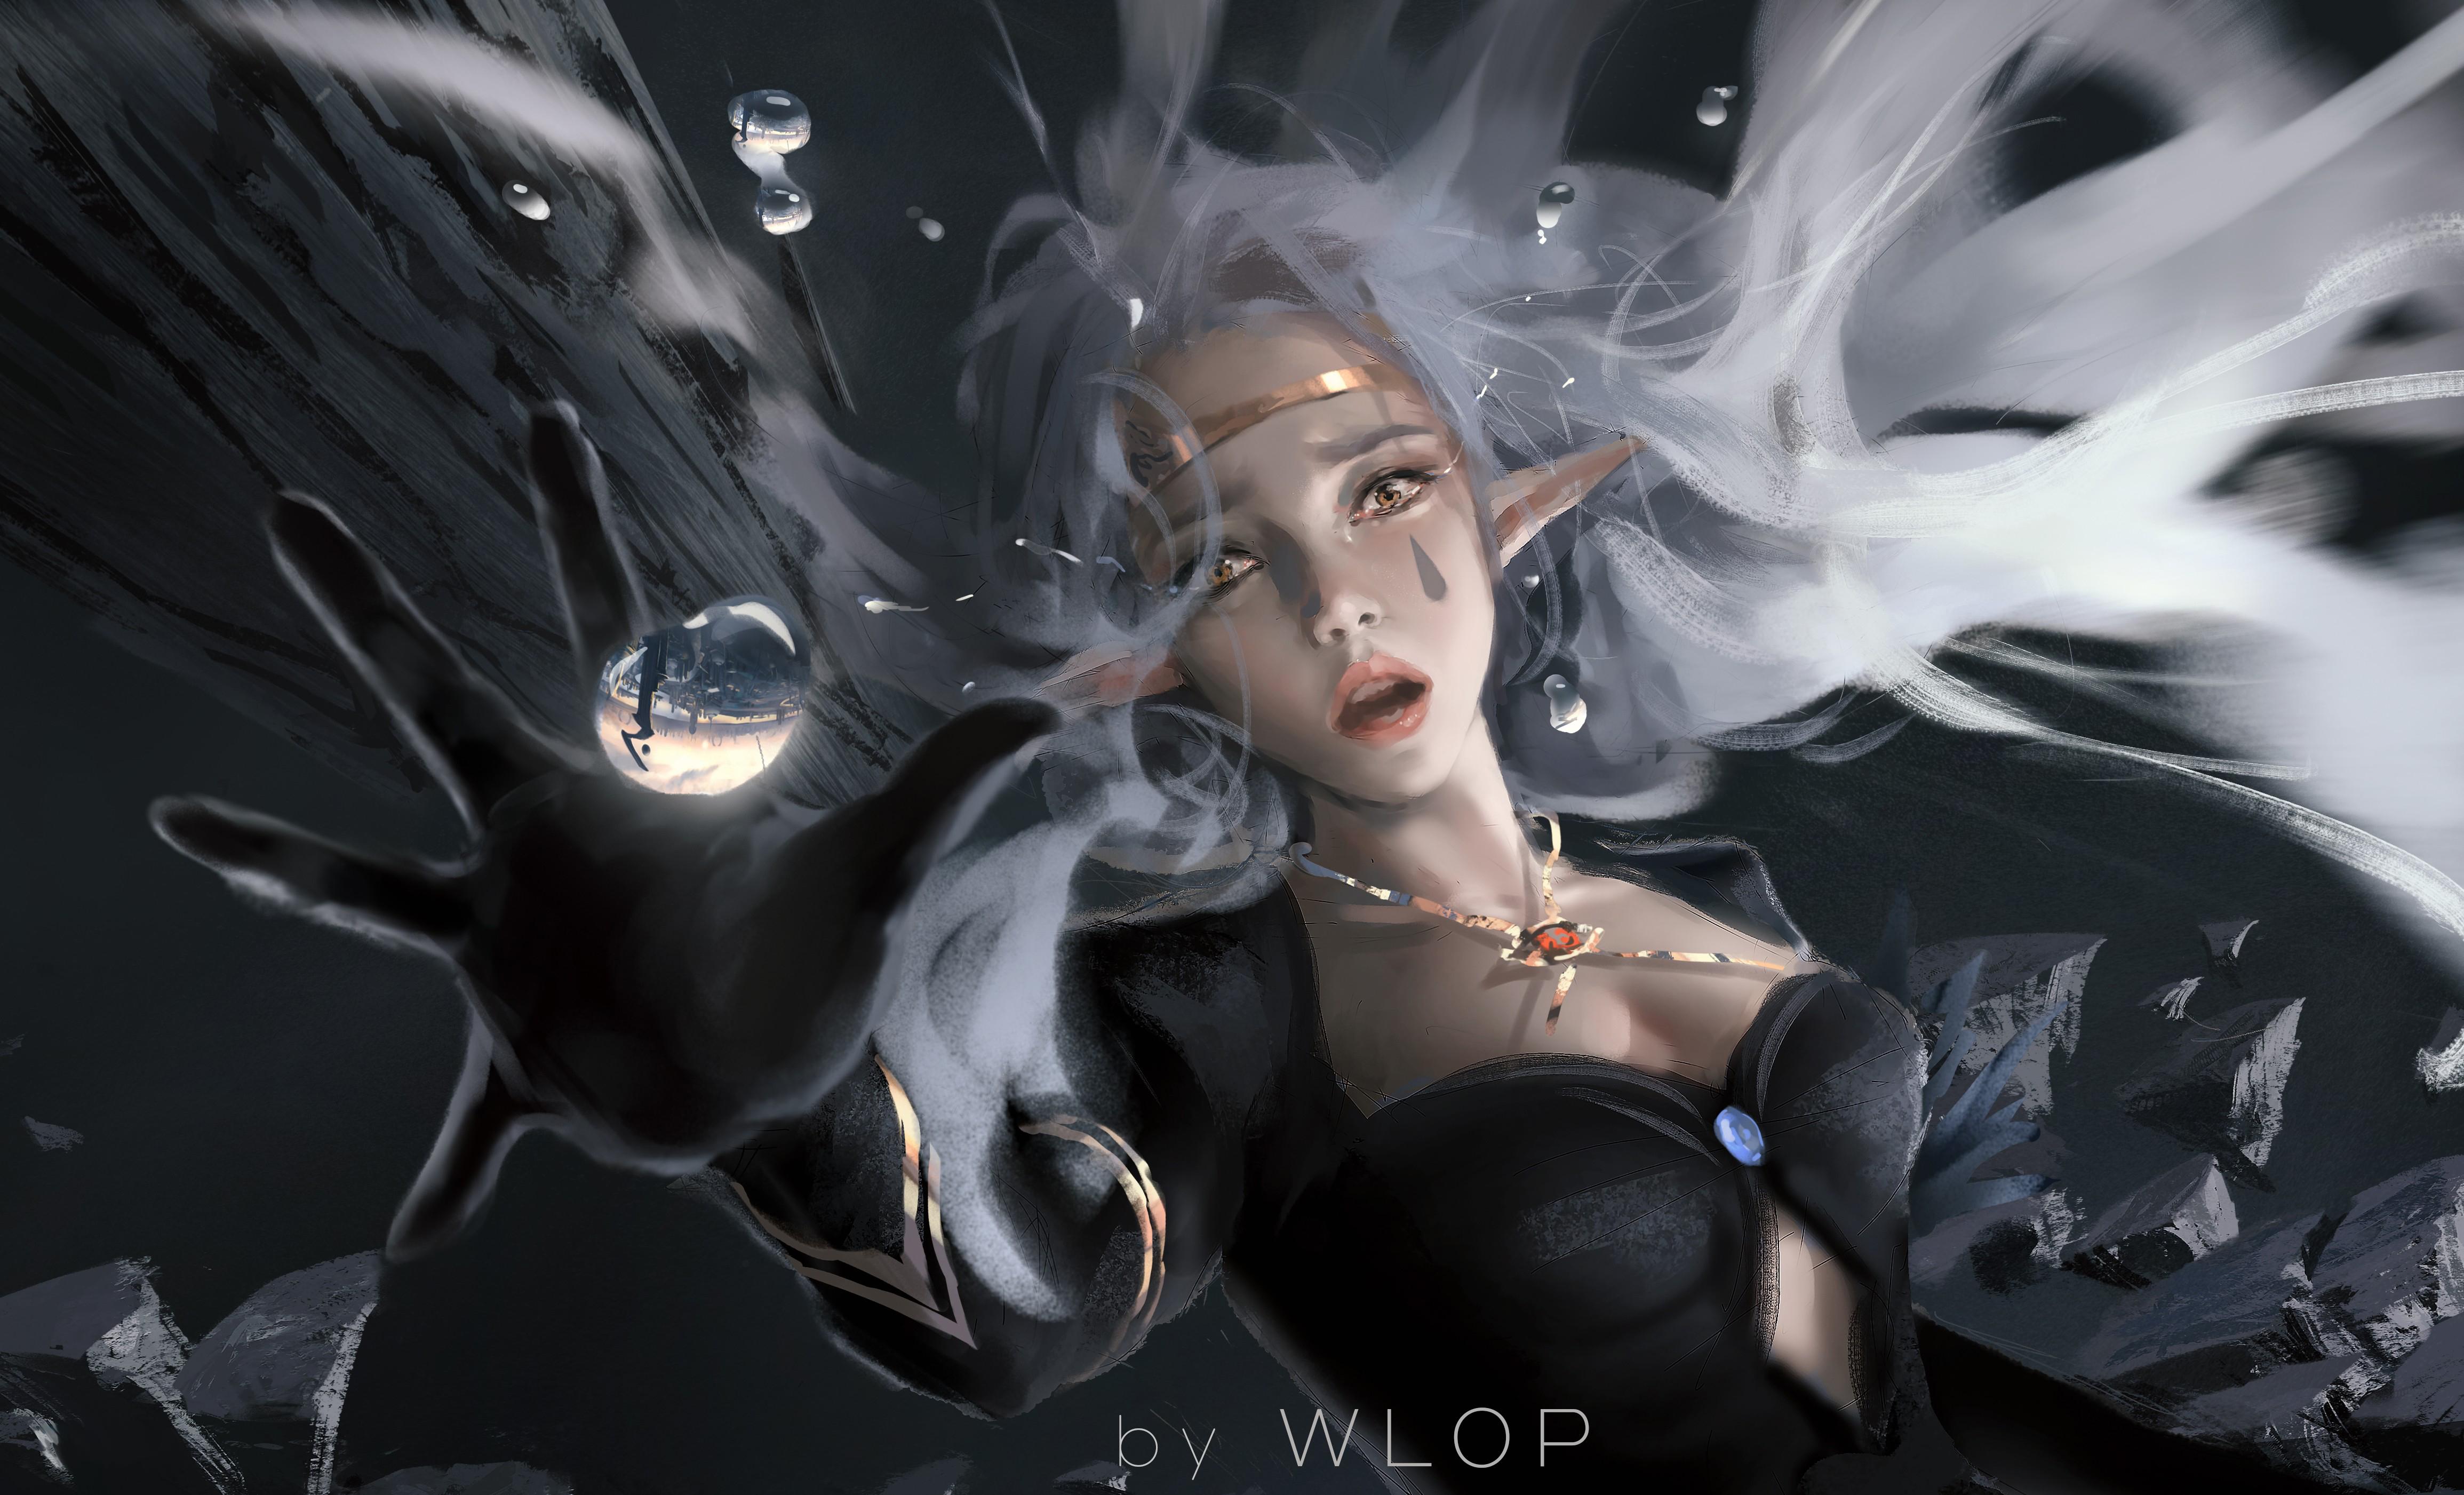 General 4619x2802 WLOP digital art artwork women white hair yellow eyes cleavage pointy ears looking at viewer falling necklace long hair fantasy girl fantasy art elves